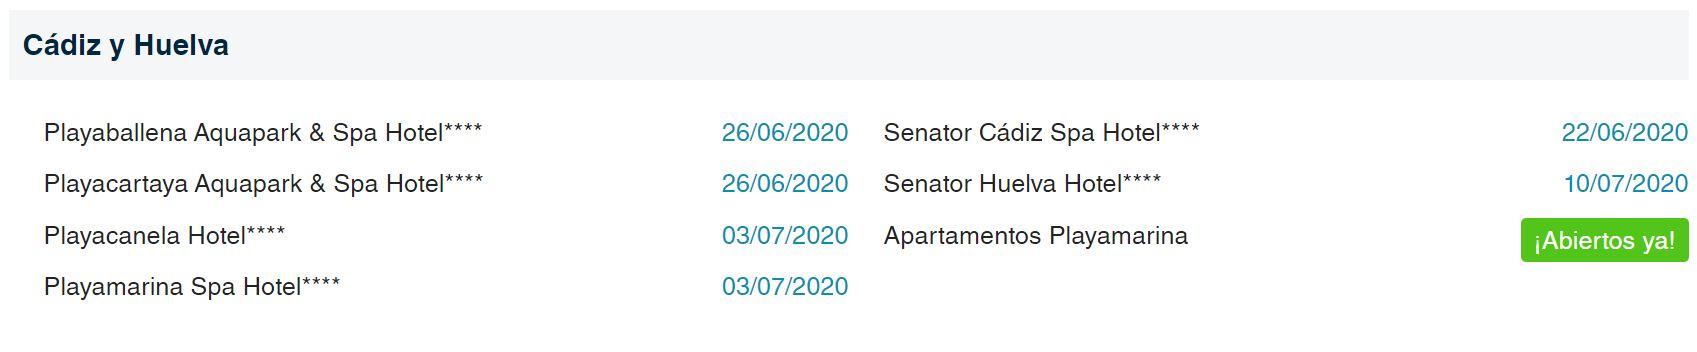 Fechas reapertura Hoteles Playa Senator Cadiz y Huelva B2Bviajes